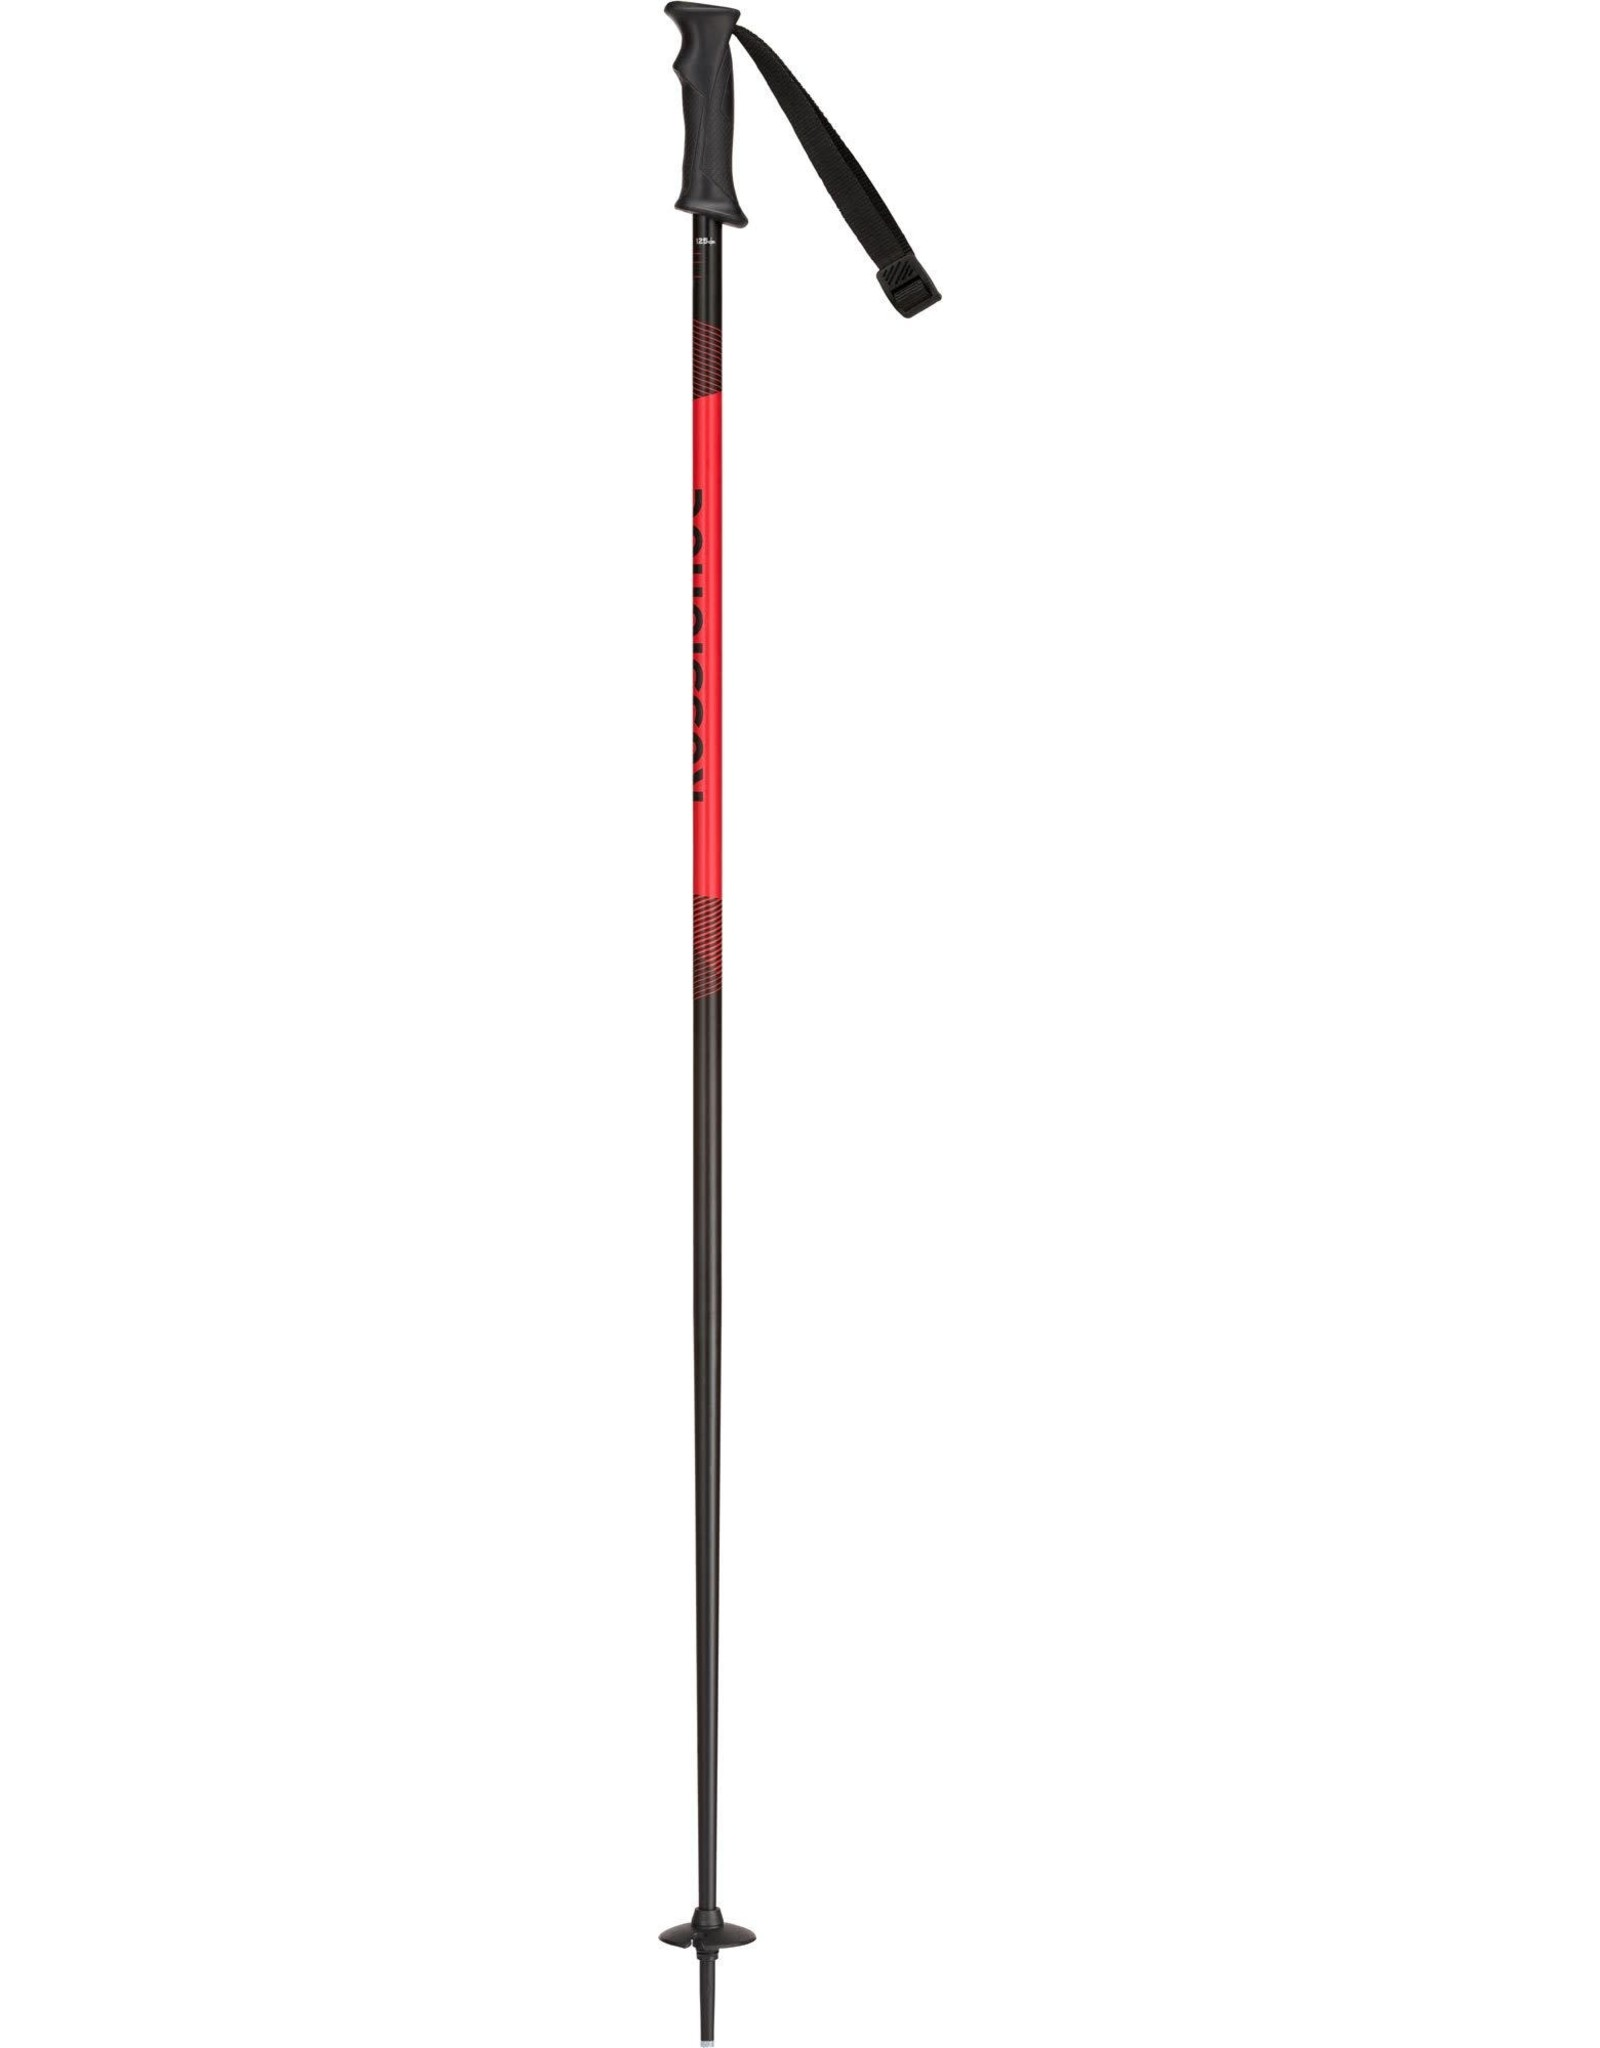 ROSSIGNOL Rossignol Tactic alpine ski pole JR blk-red 22